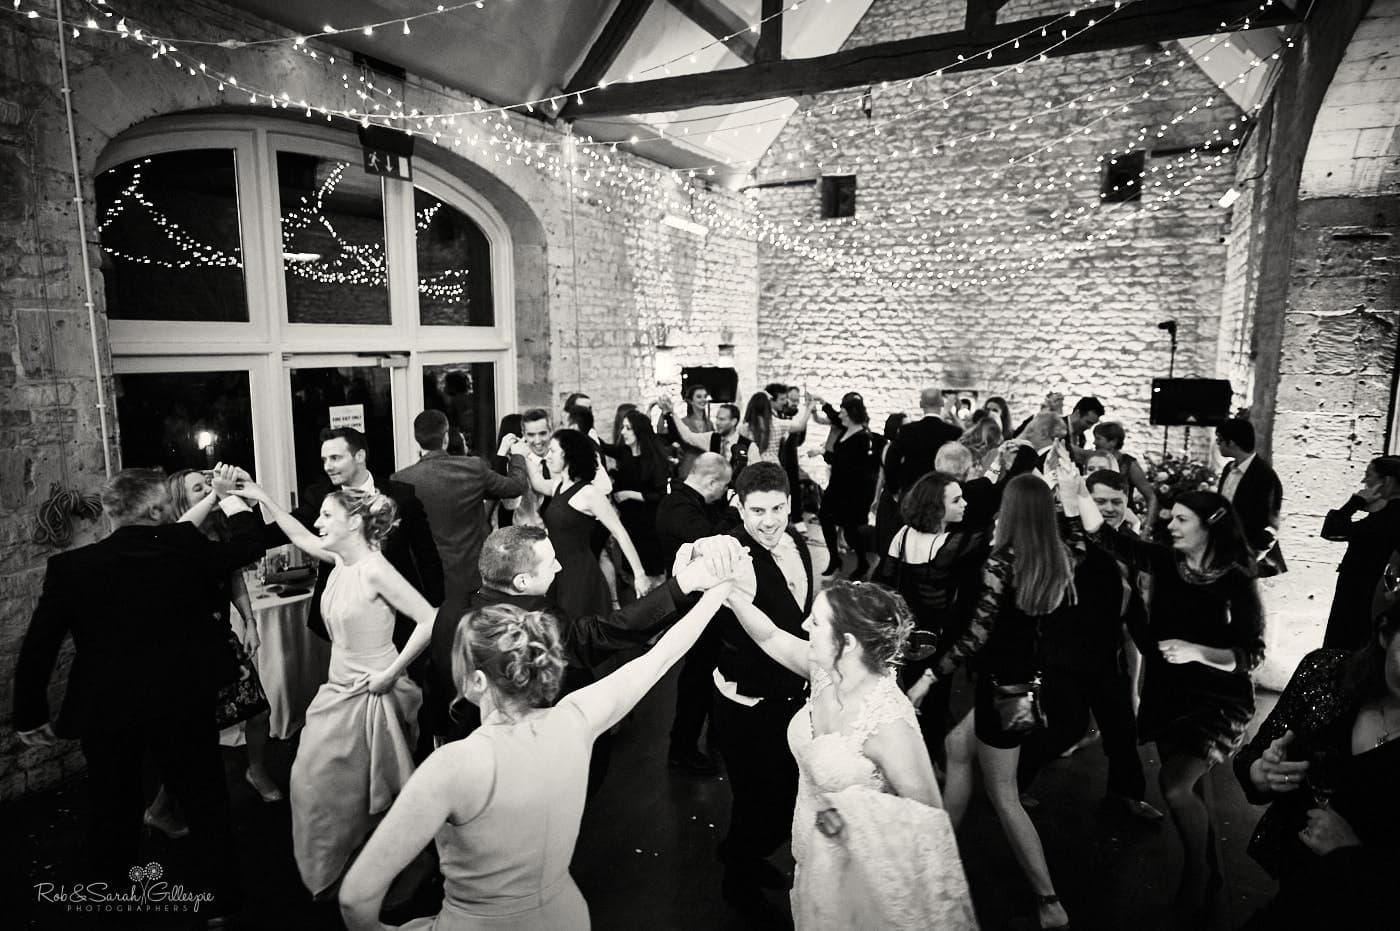 Dancing at Lapstone Barn wedding